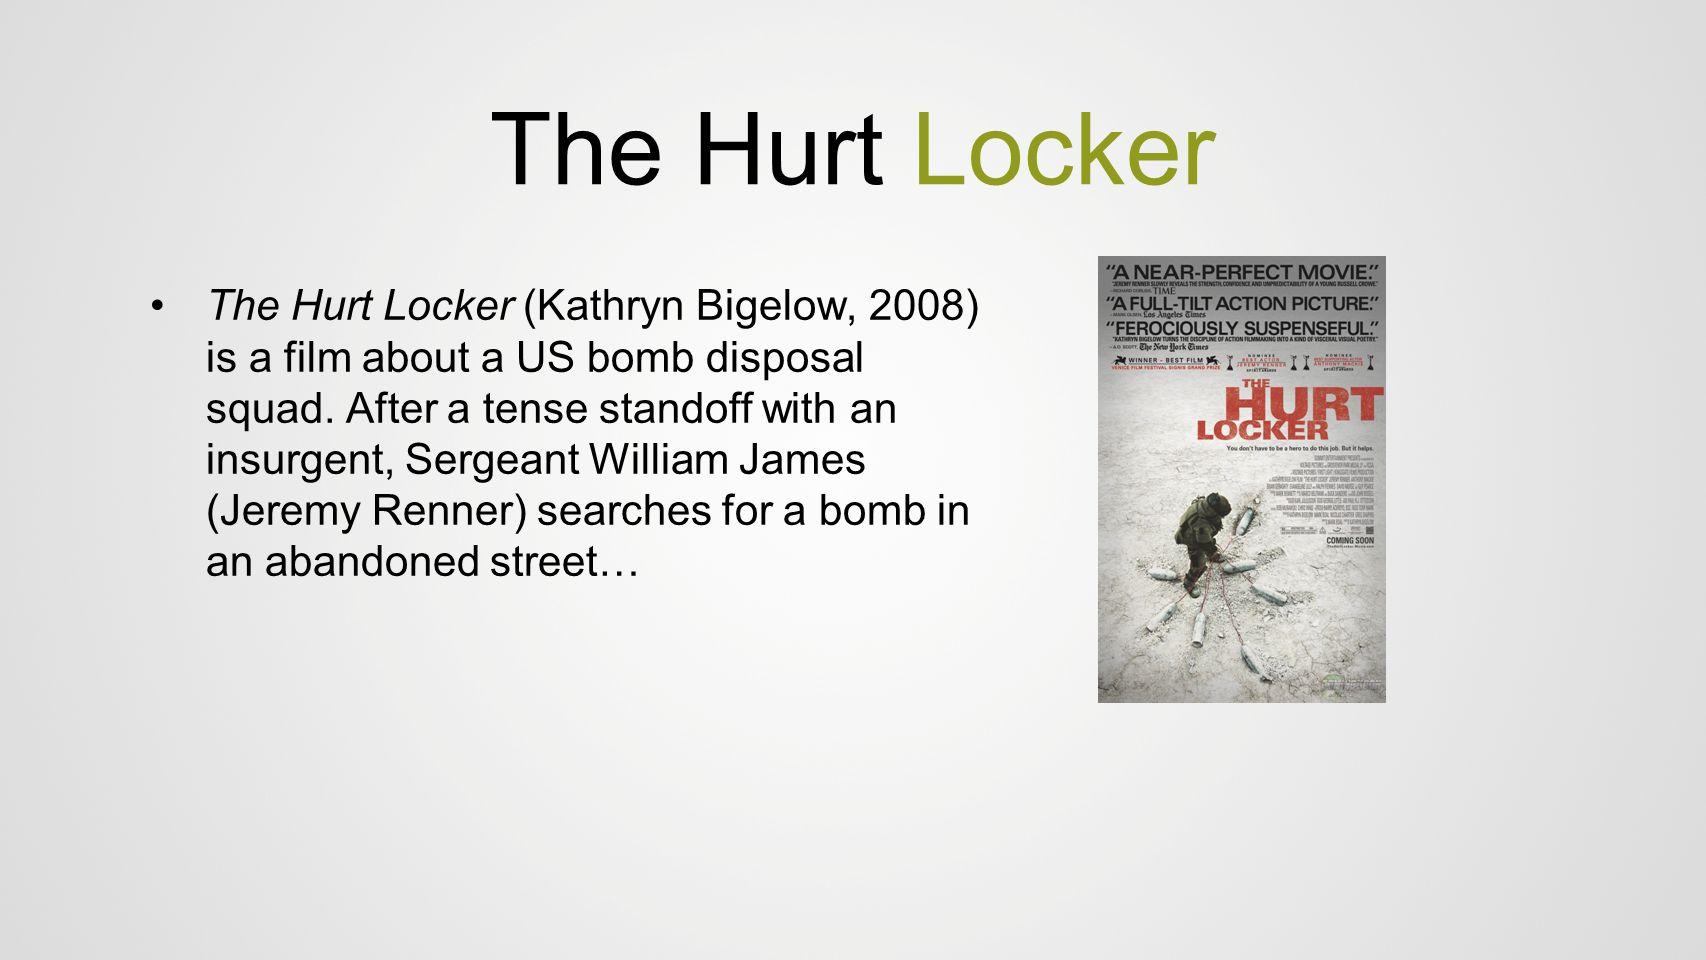 The Hurt Locker The Hurt Locker (Kathryn Bigelow, 2008) is a film about a US bomb disposal squad. After a tense standoff with an insurgent, Sergeant W